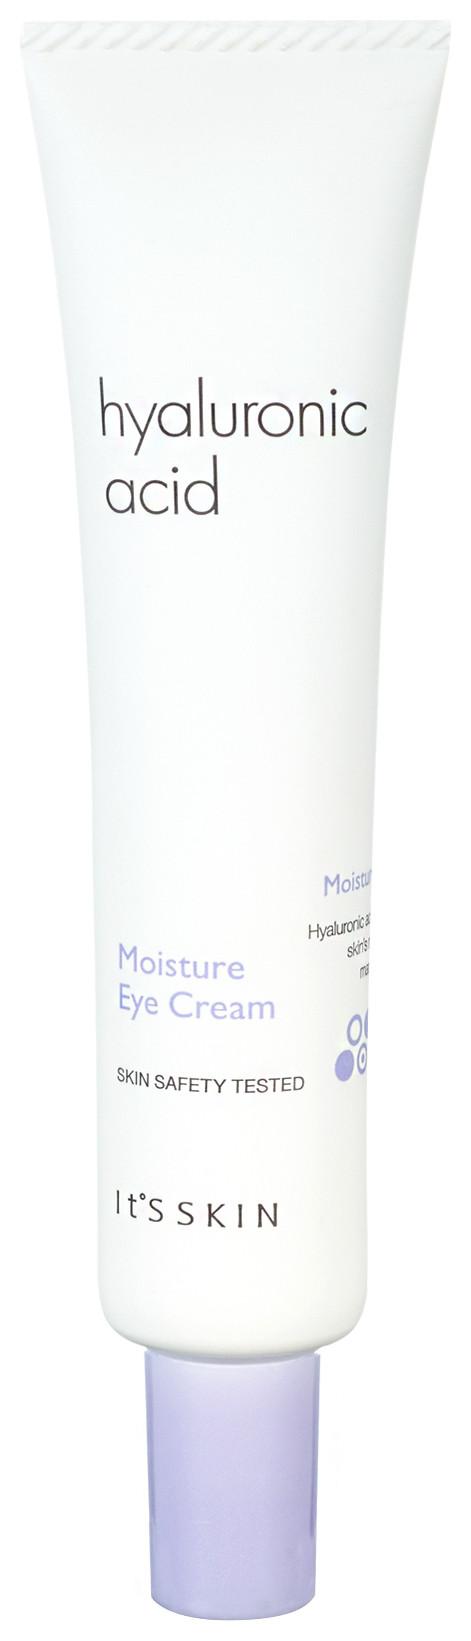 Увлажняющий крем для глаз с гиалуроновой кислотой Hyaluronic Acid Moisture Eye Cream It's Skin Hyaluronic acid